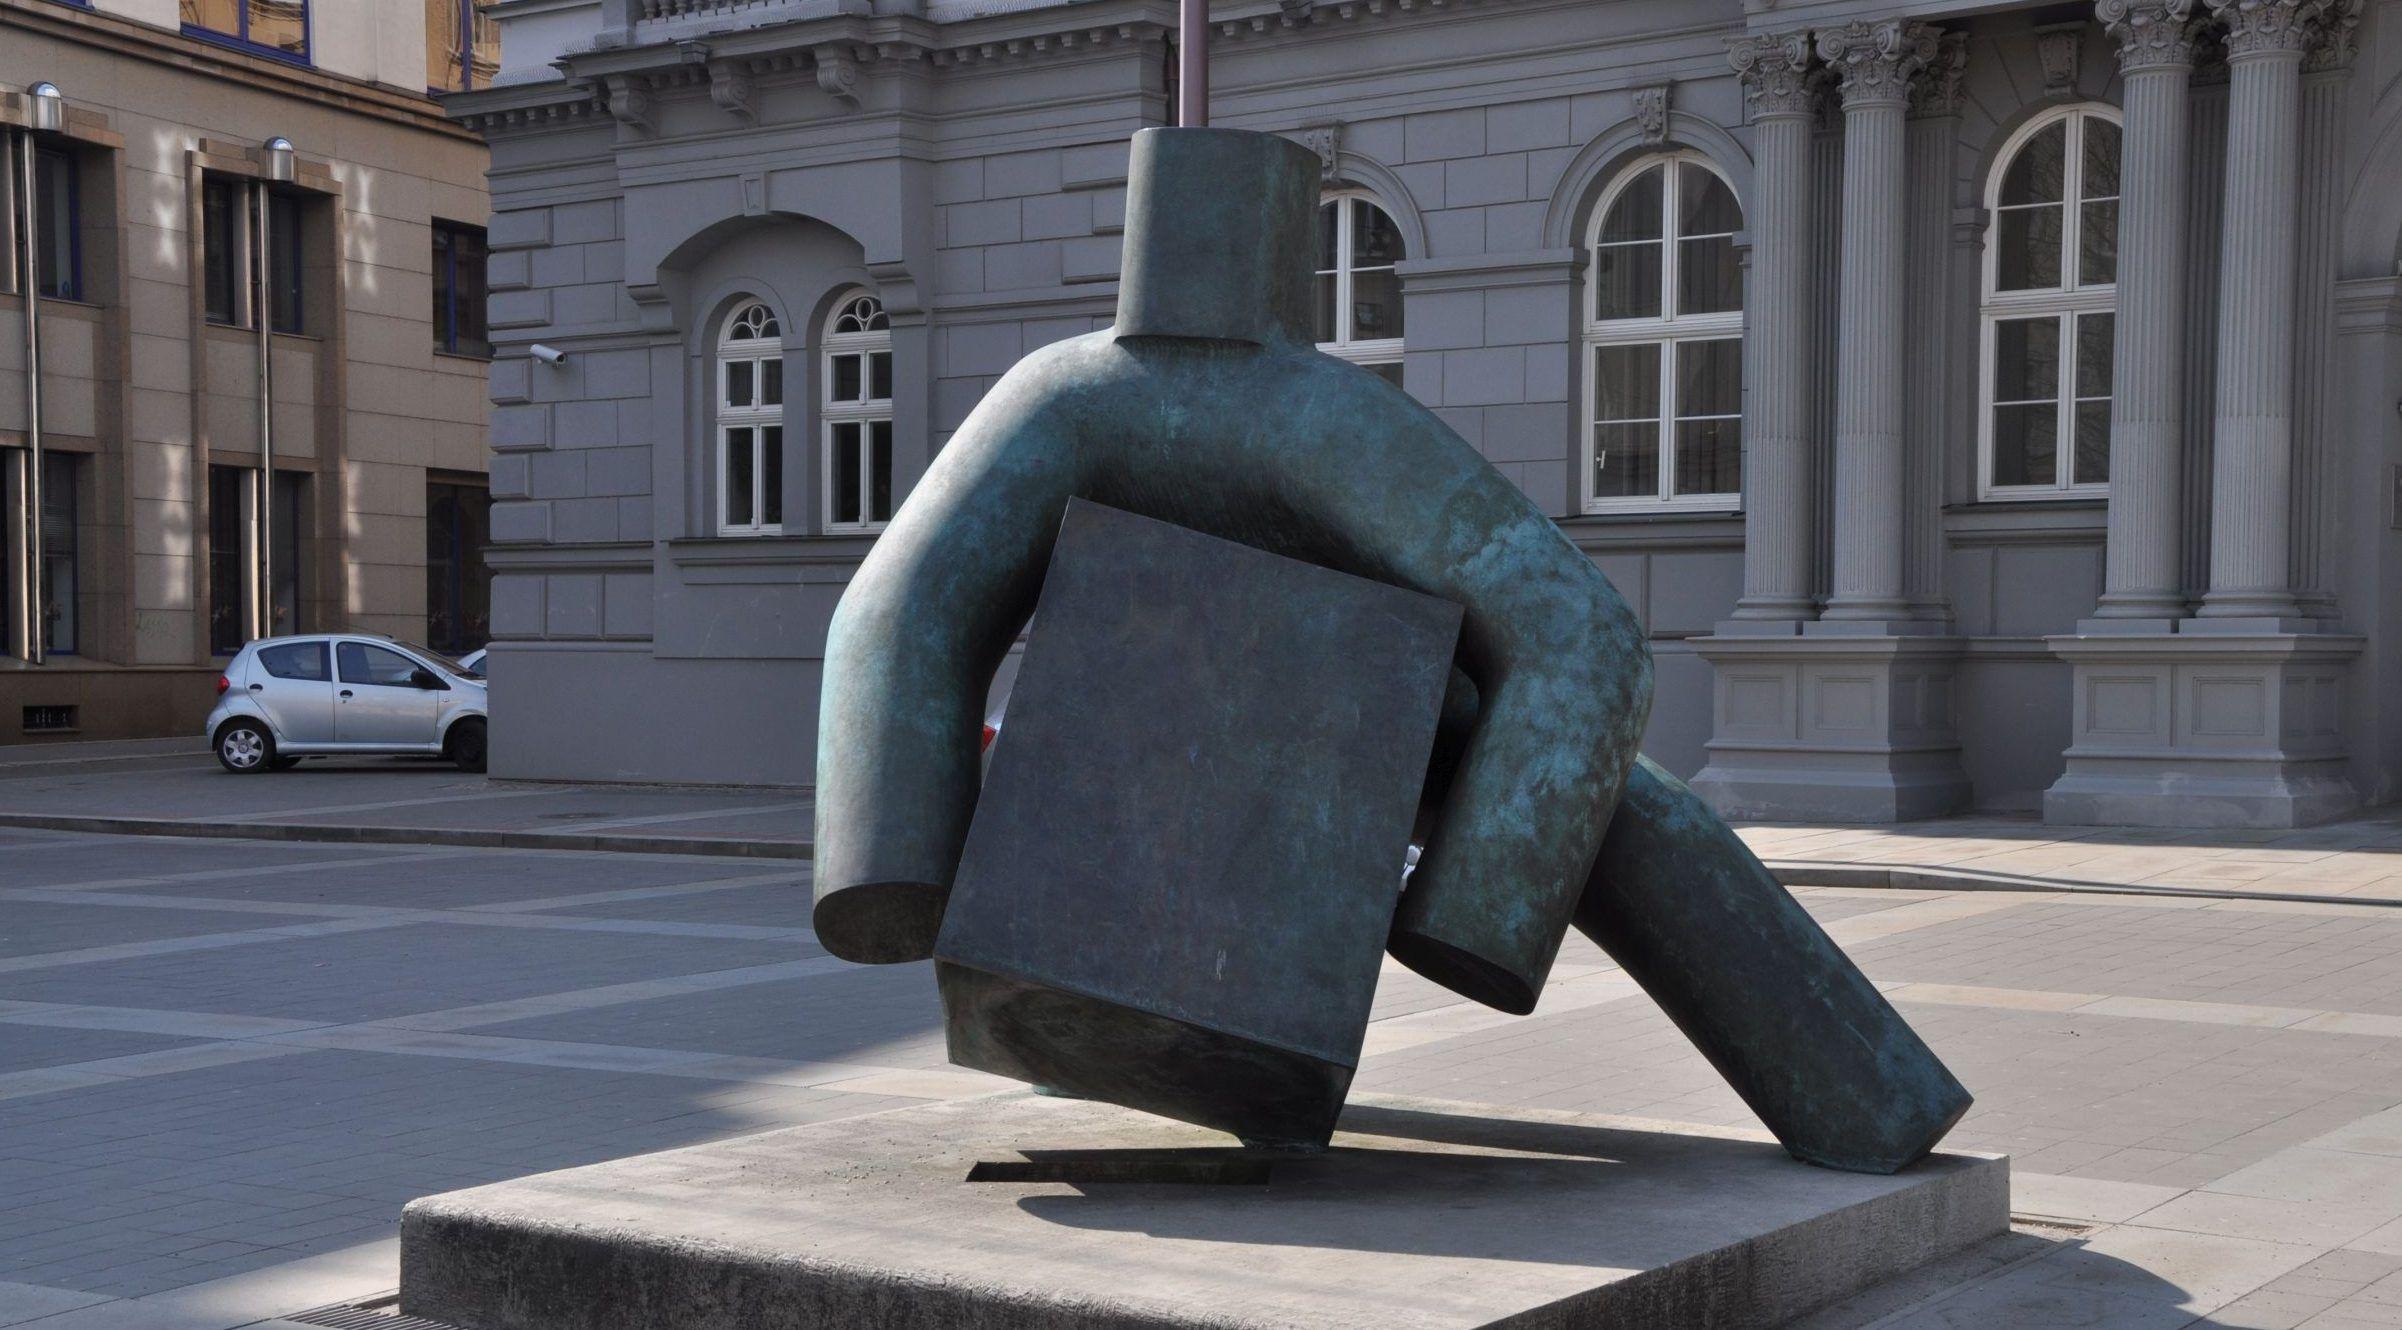 socha Marius Kotrba: Spravedlnost v Brně